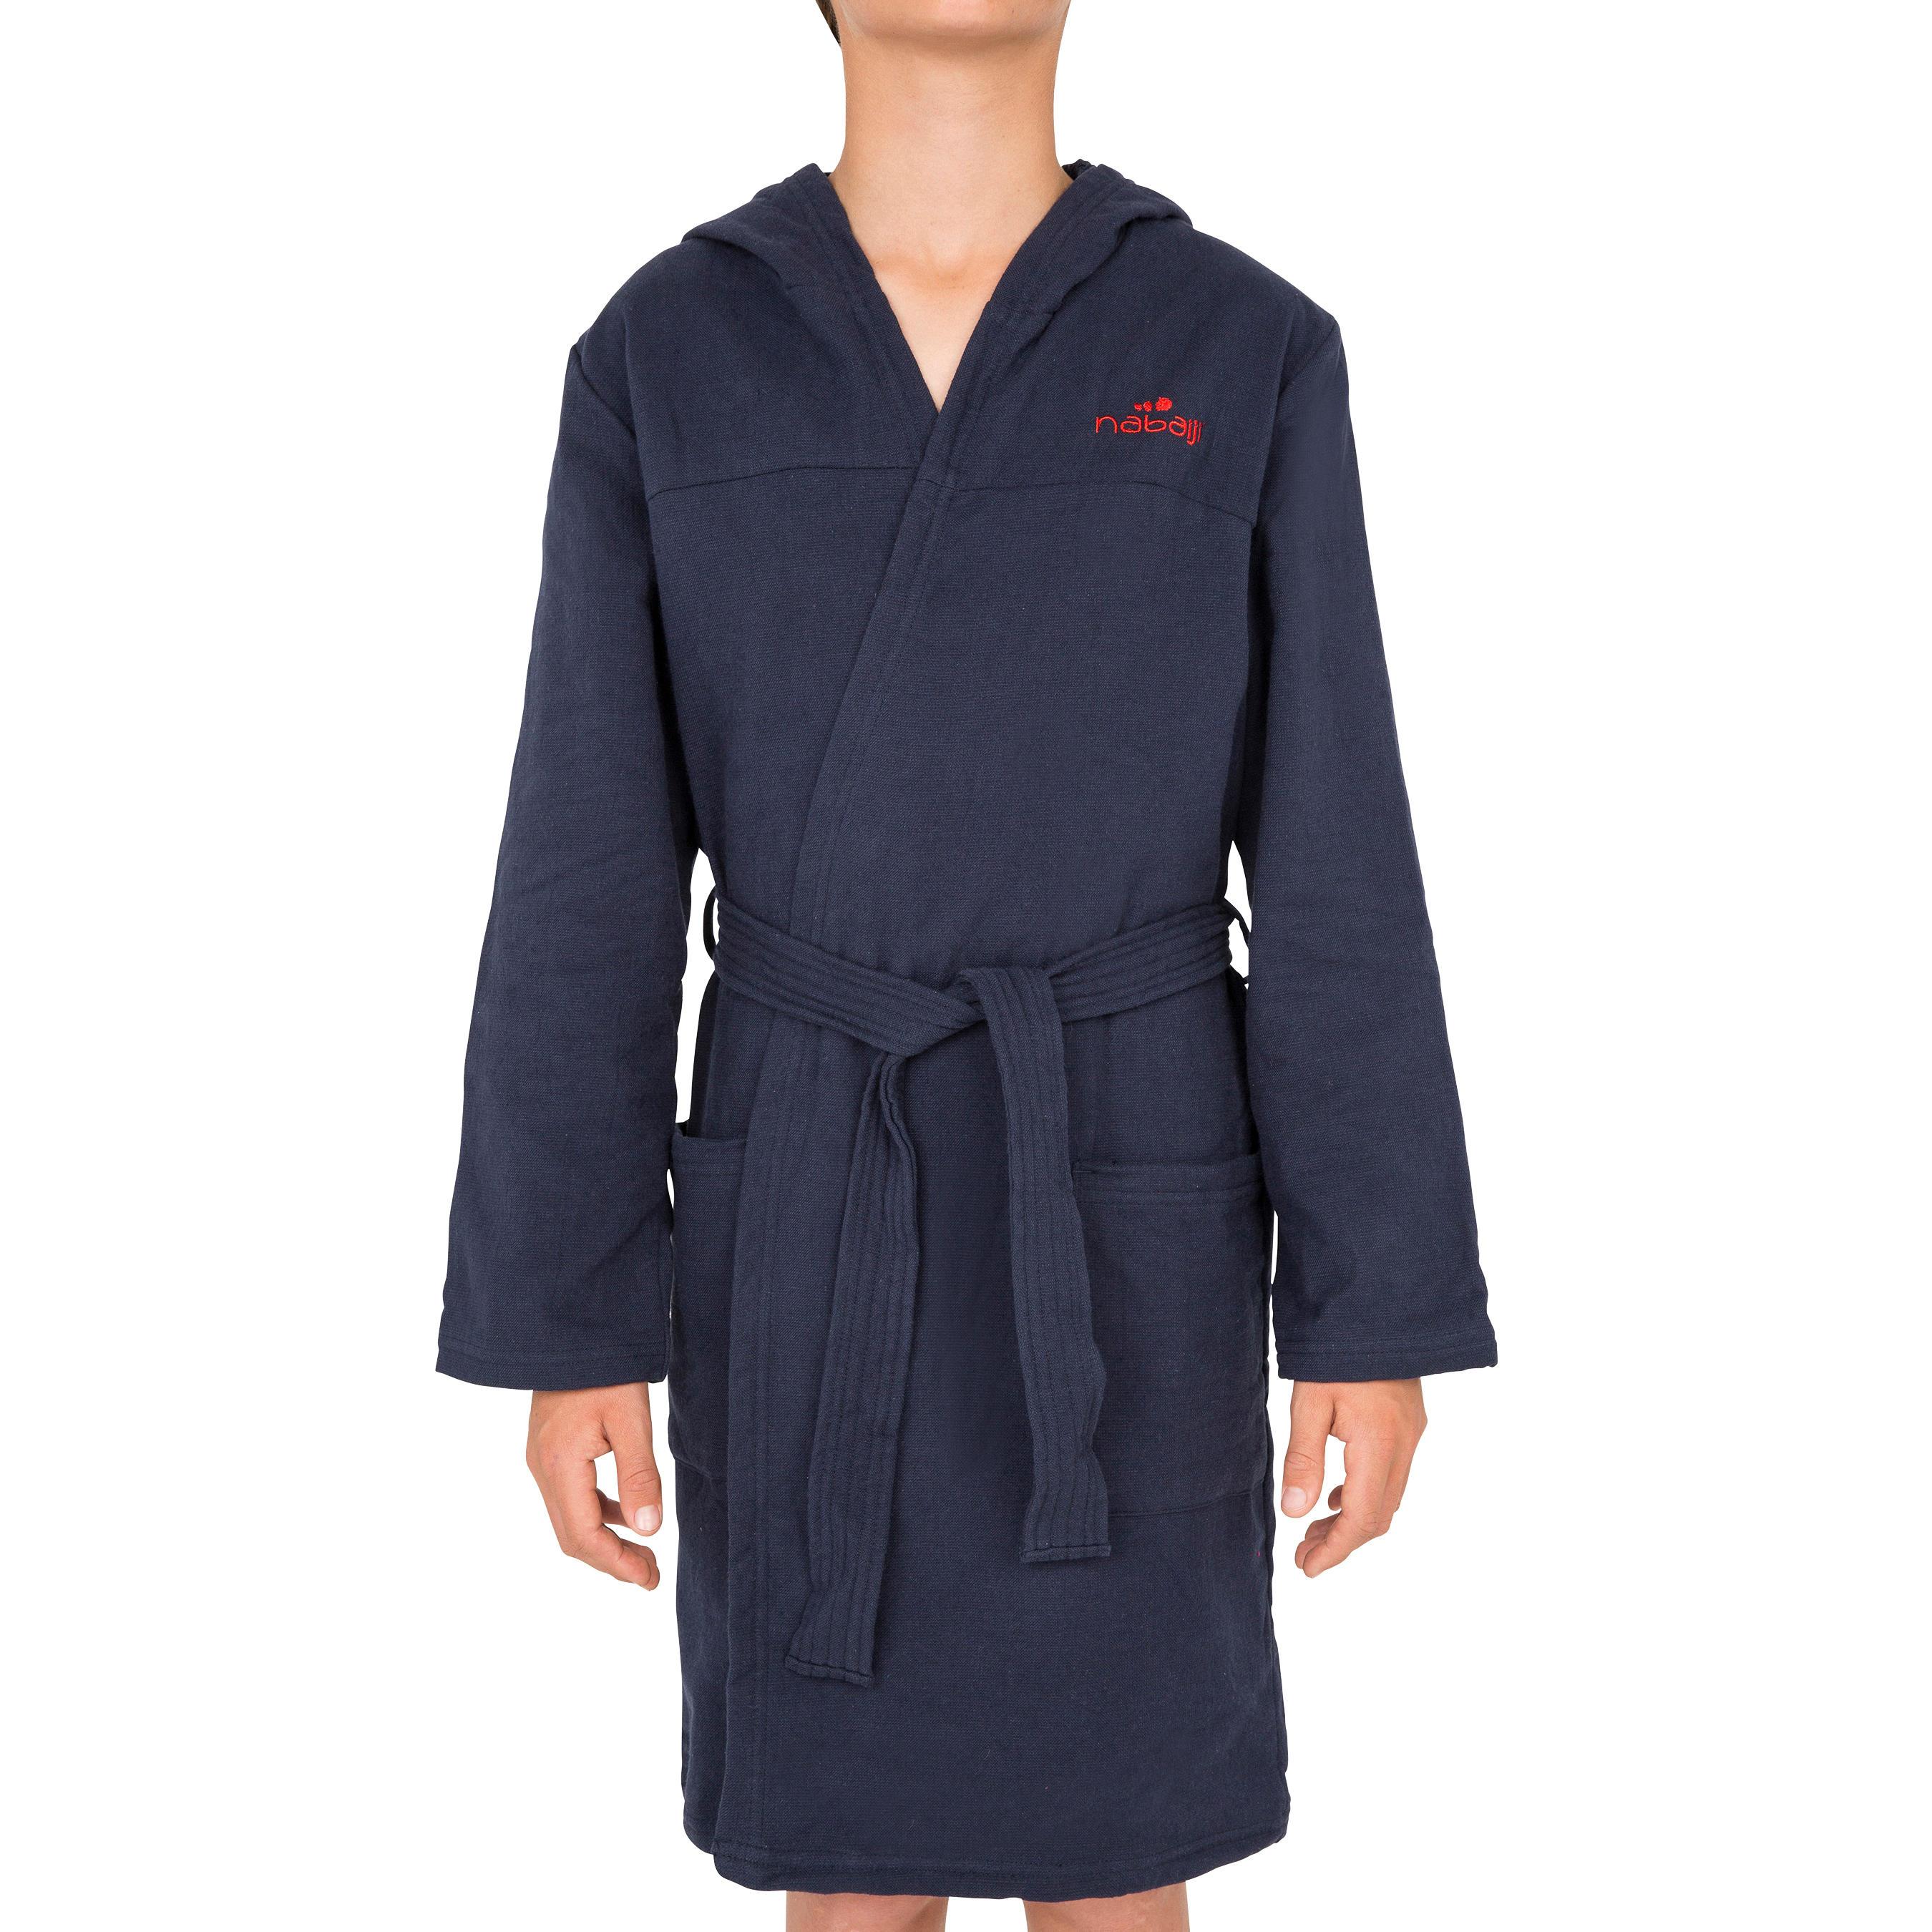 Kids' Lightweight Cotton Pool Bathrobe with Hood, Pocket & Belt - Navy Blue